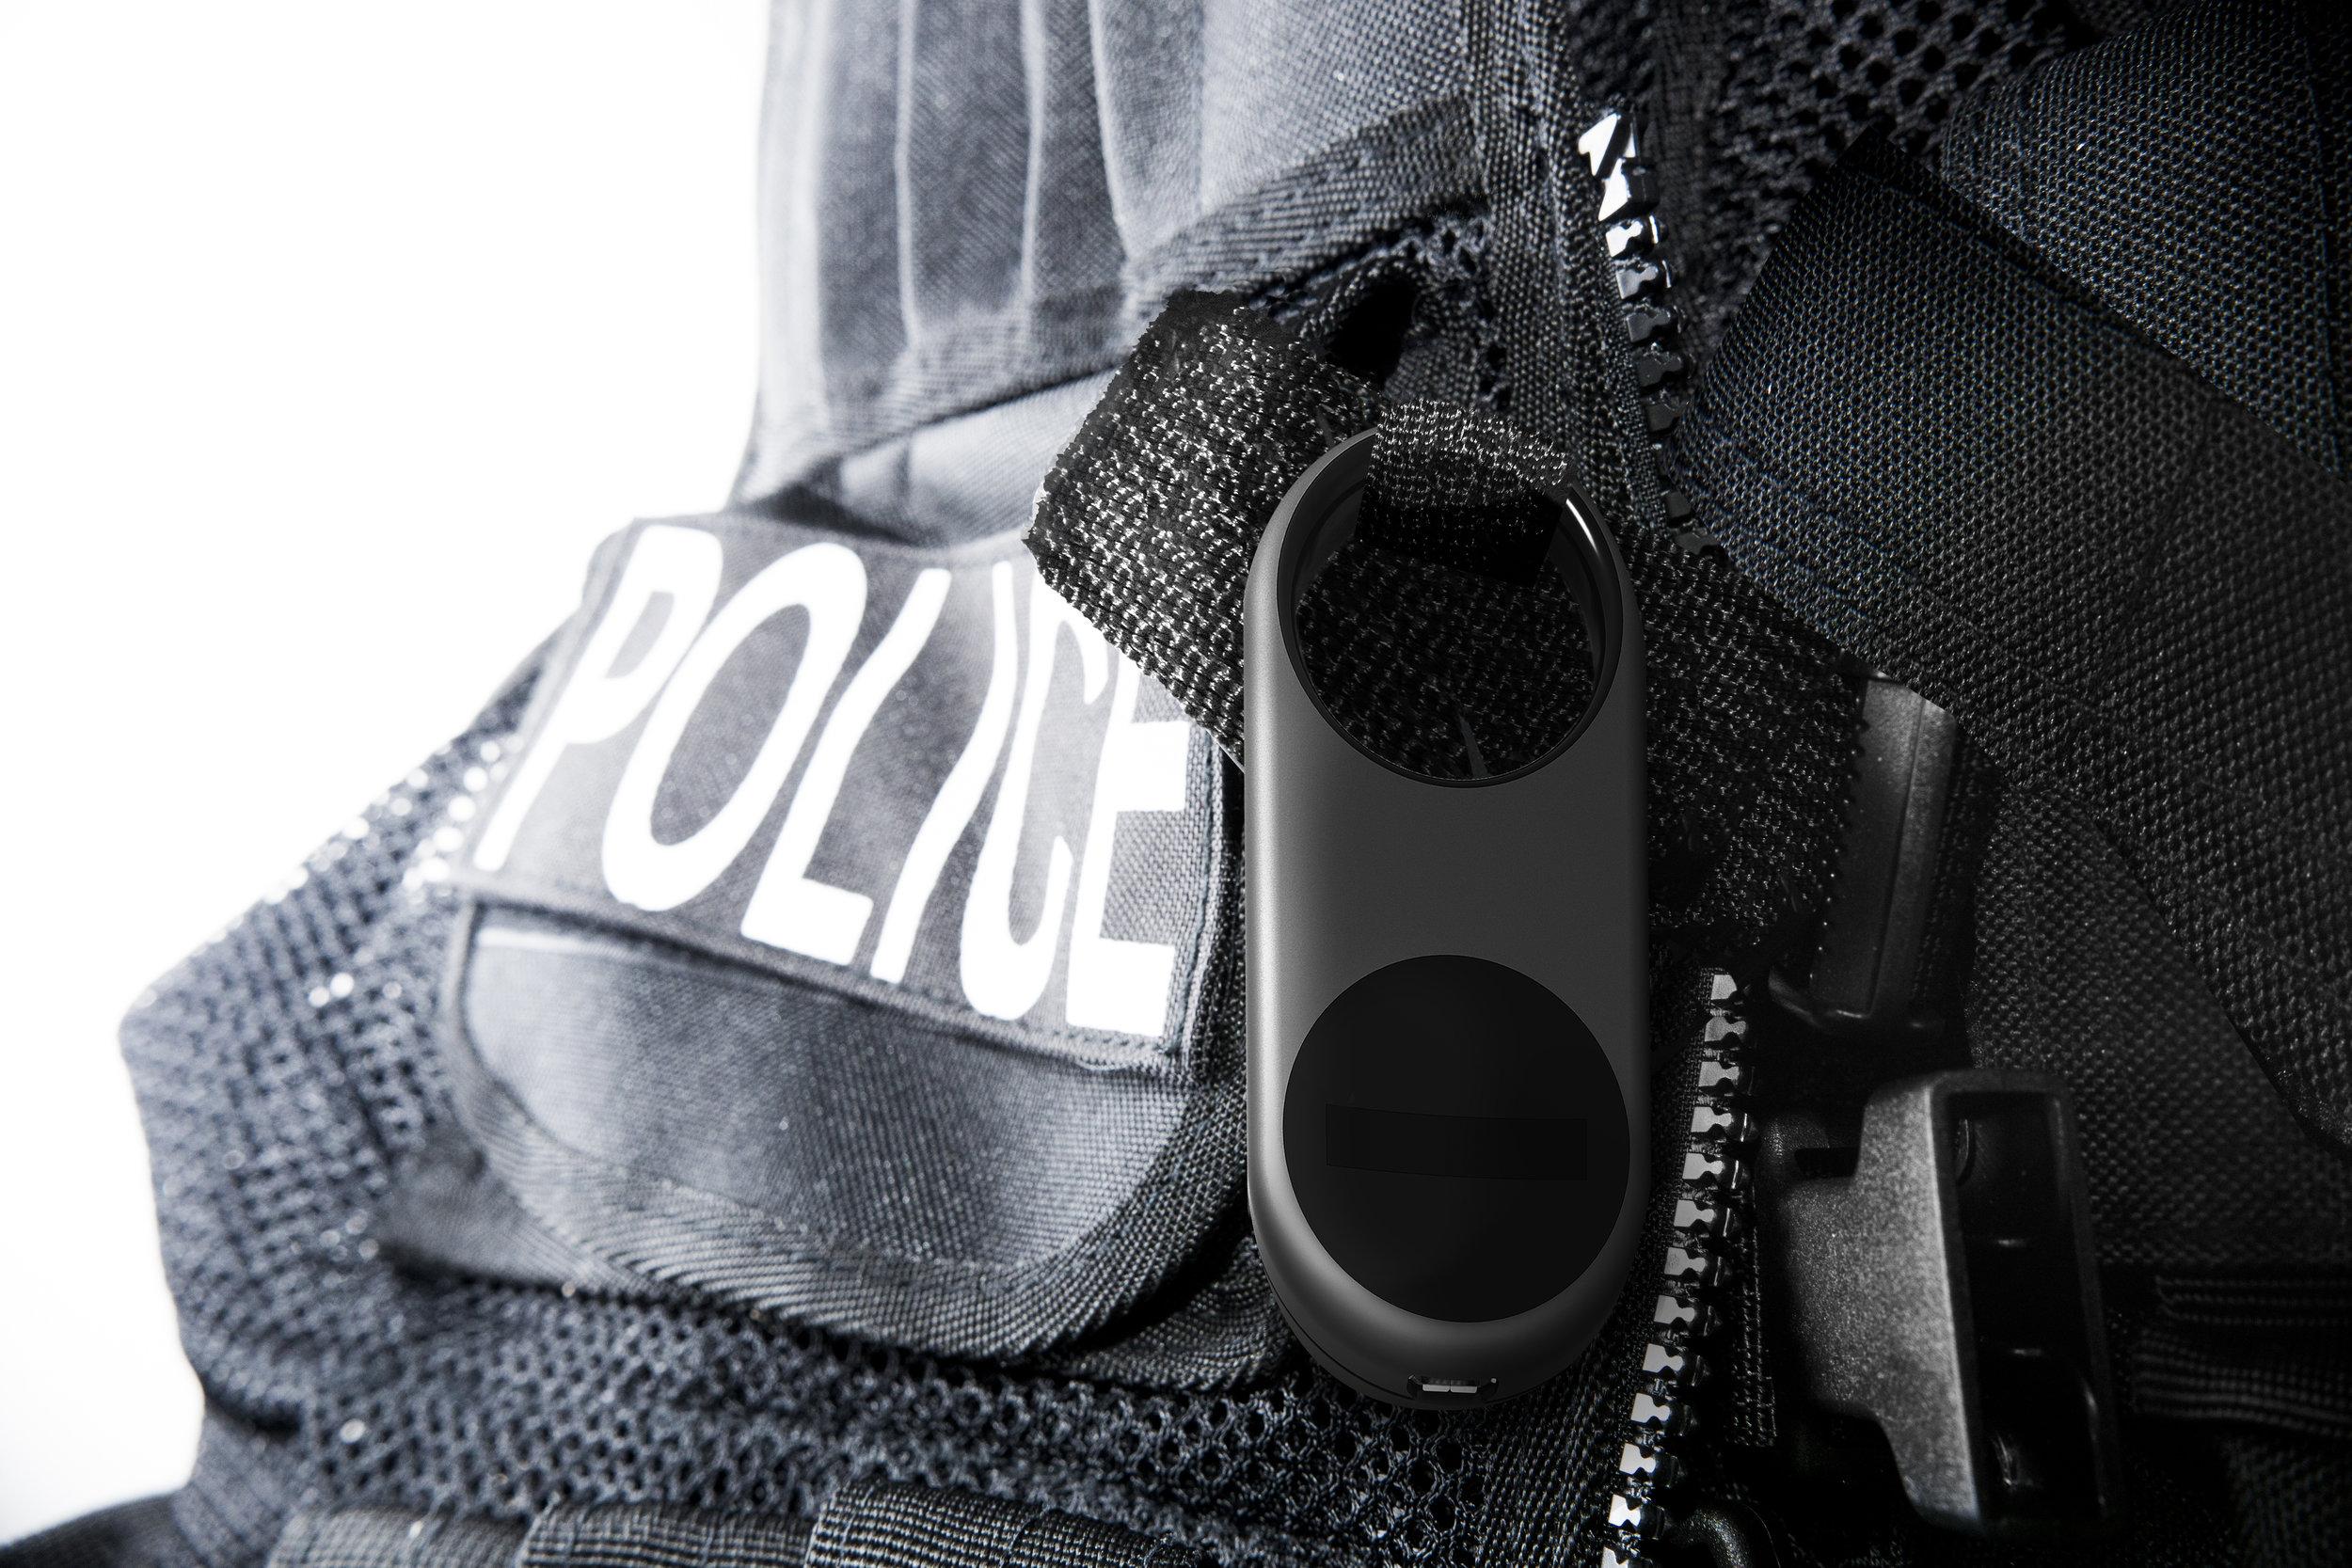 policefob.jpg